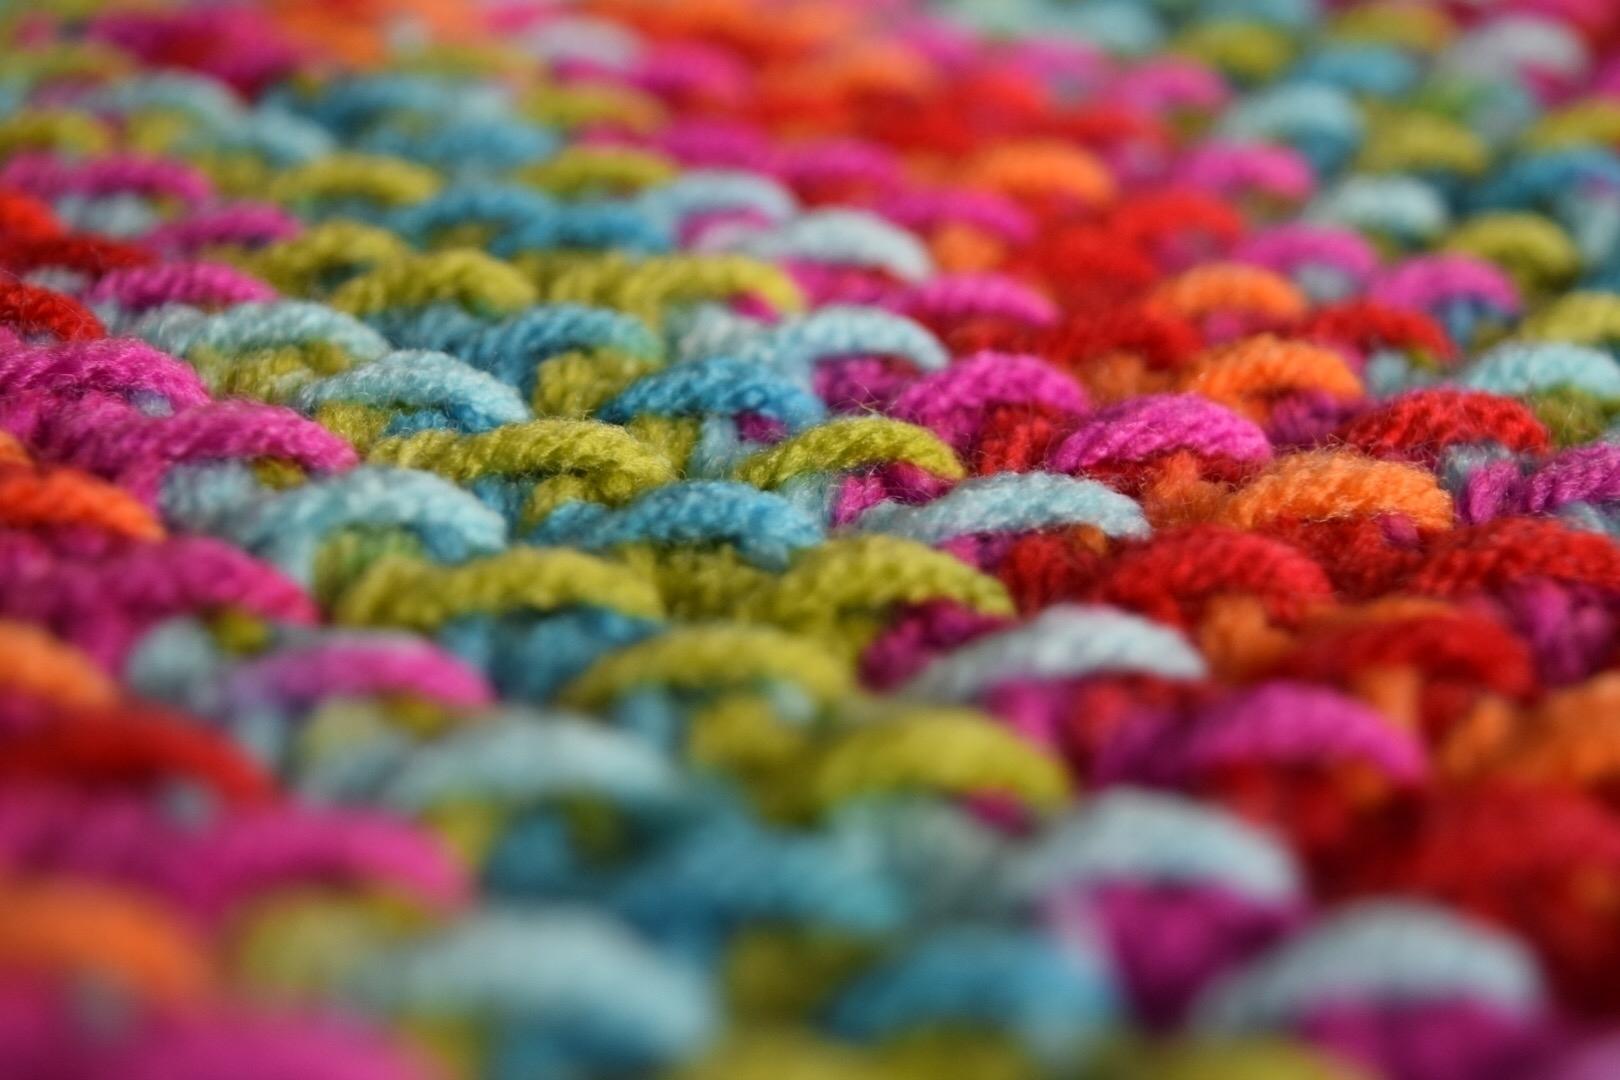 L⃣ⓘⓝⓓⓢⓔⓨF⃣ⓐⓨⓔ (@crochetbylindseyfaye) Cover Image